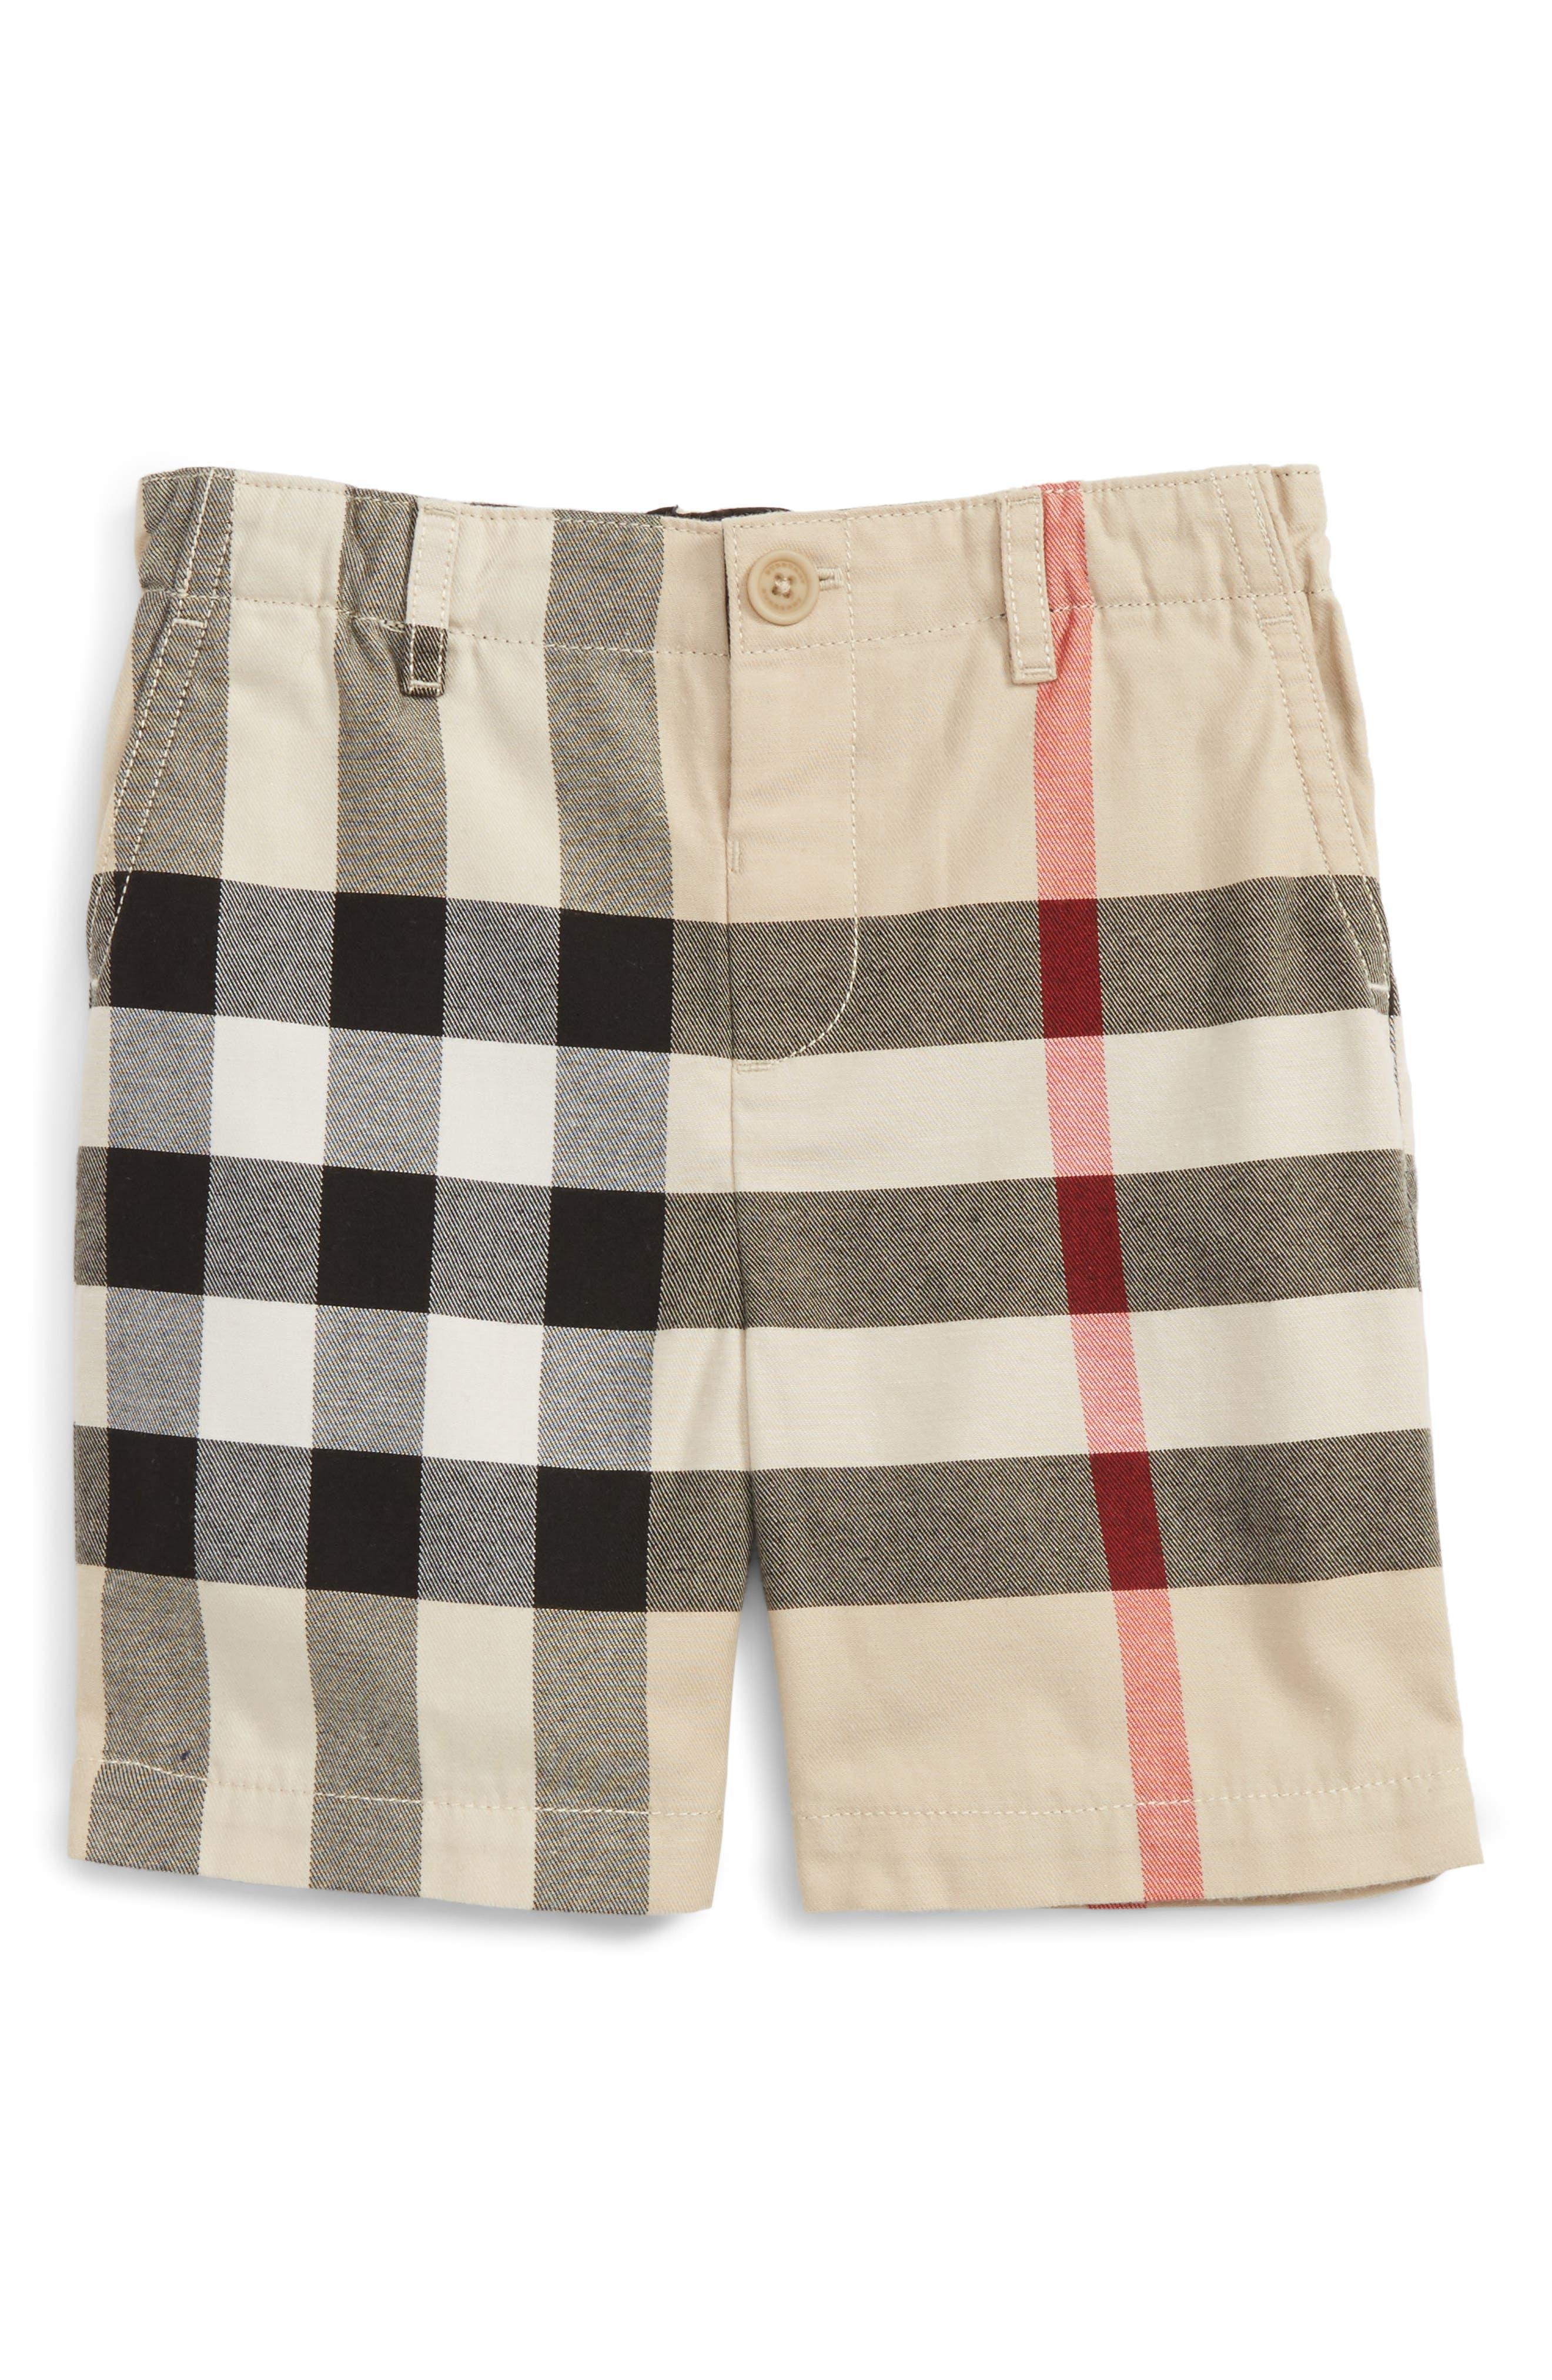 BURBERRY Sean Check Print Shorts, Main, color, 250